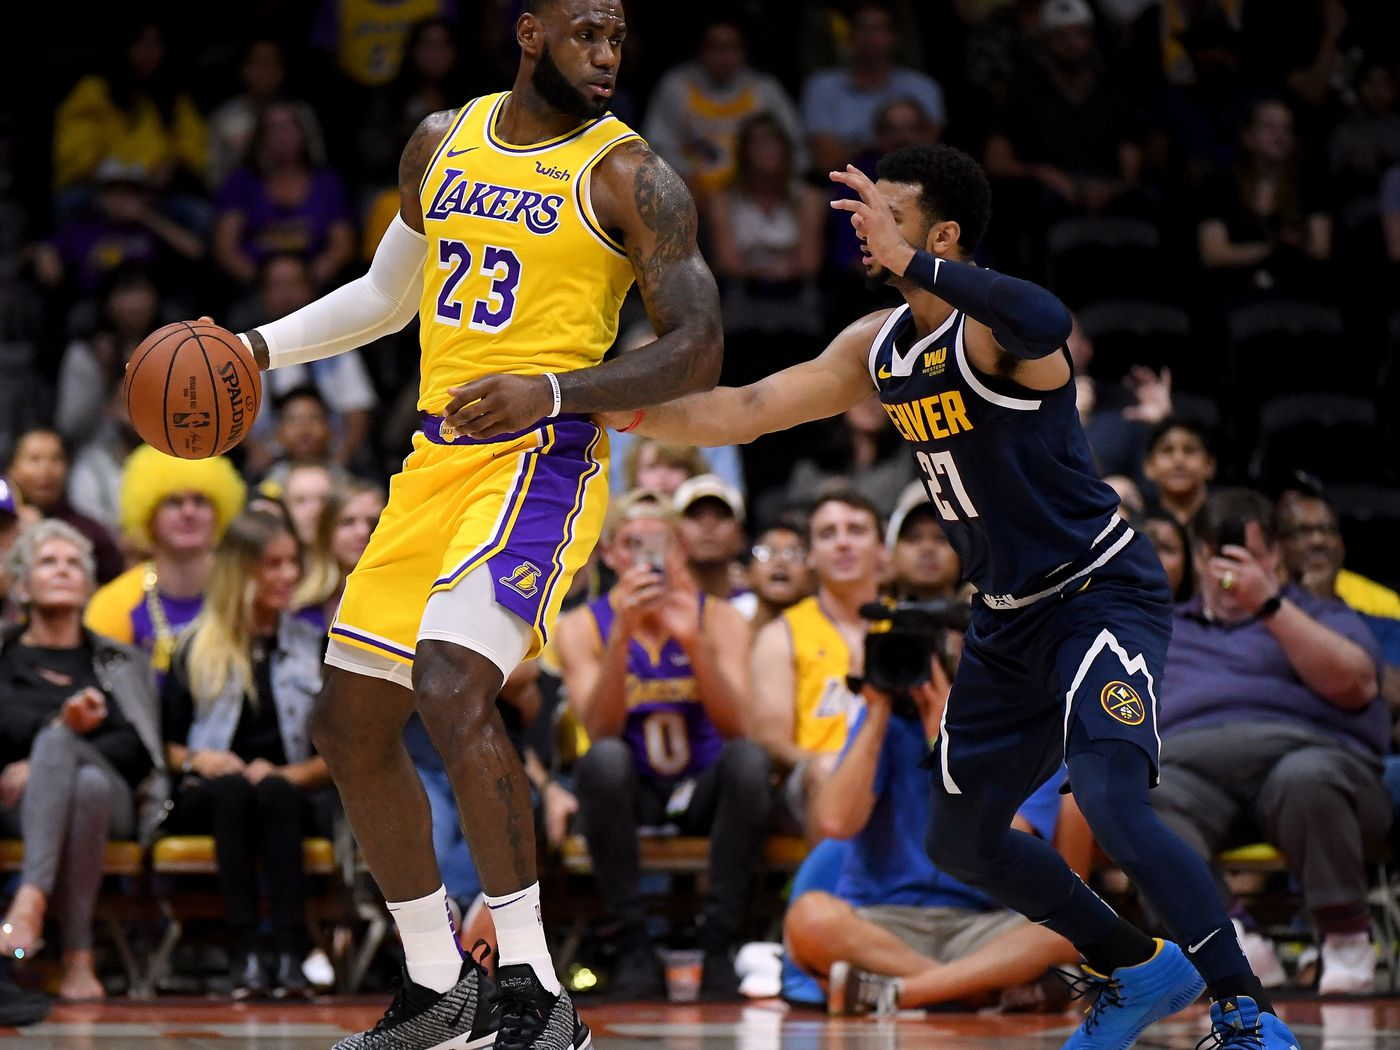 1820ff3e907 Lakers vs. Nuggets Final Score  Hot shooting Nuggets spoil LeBron ...